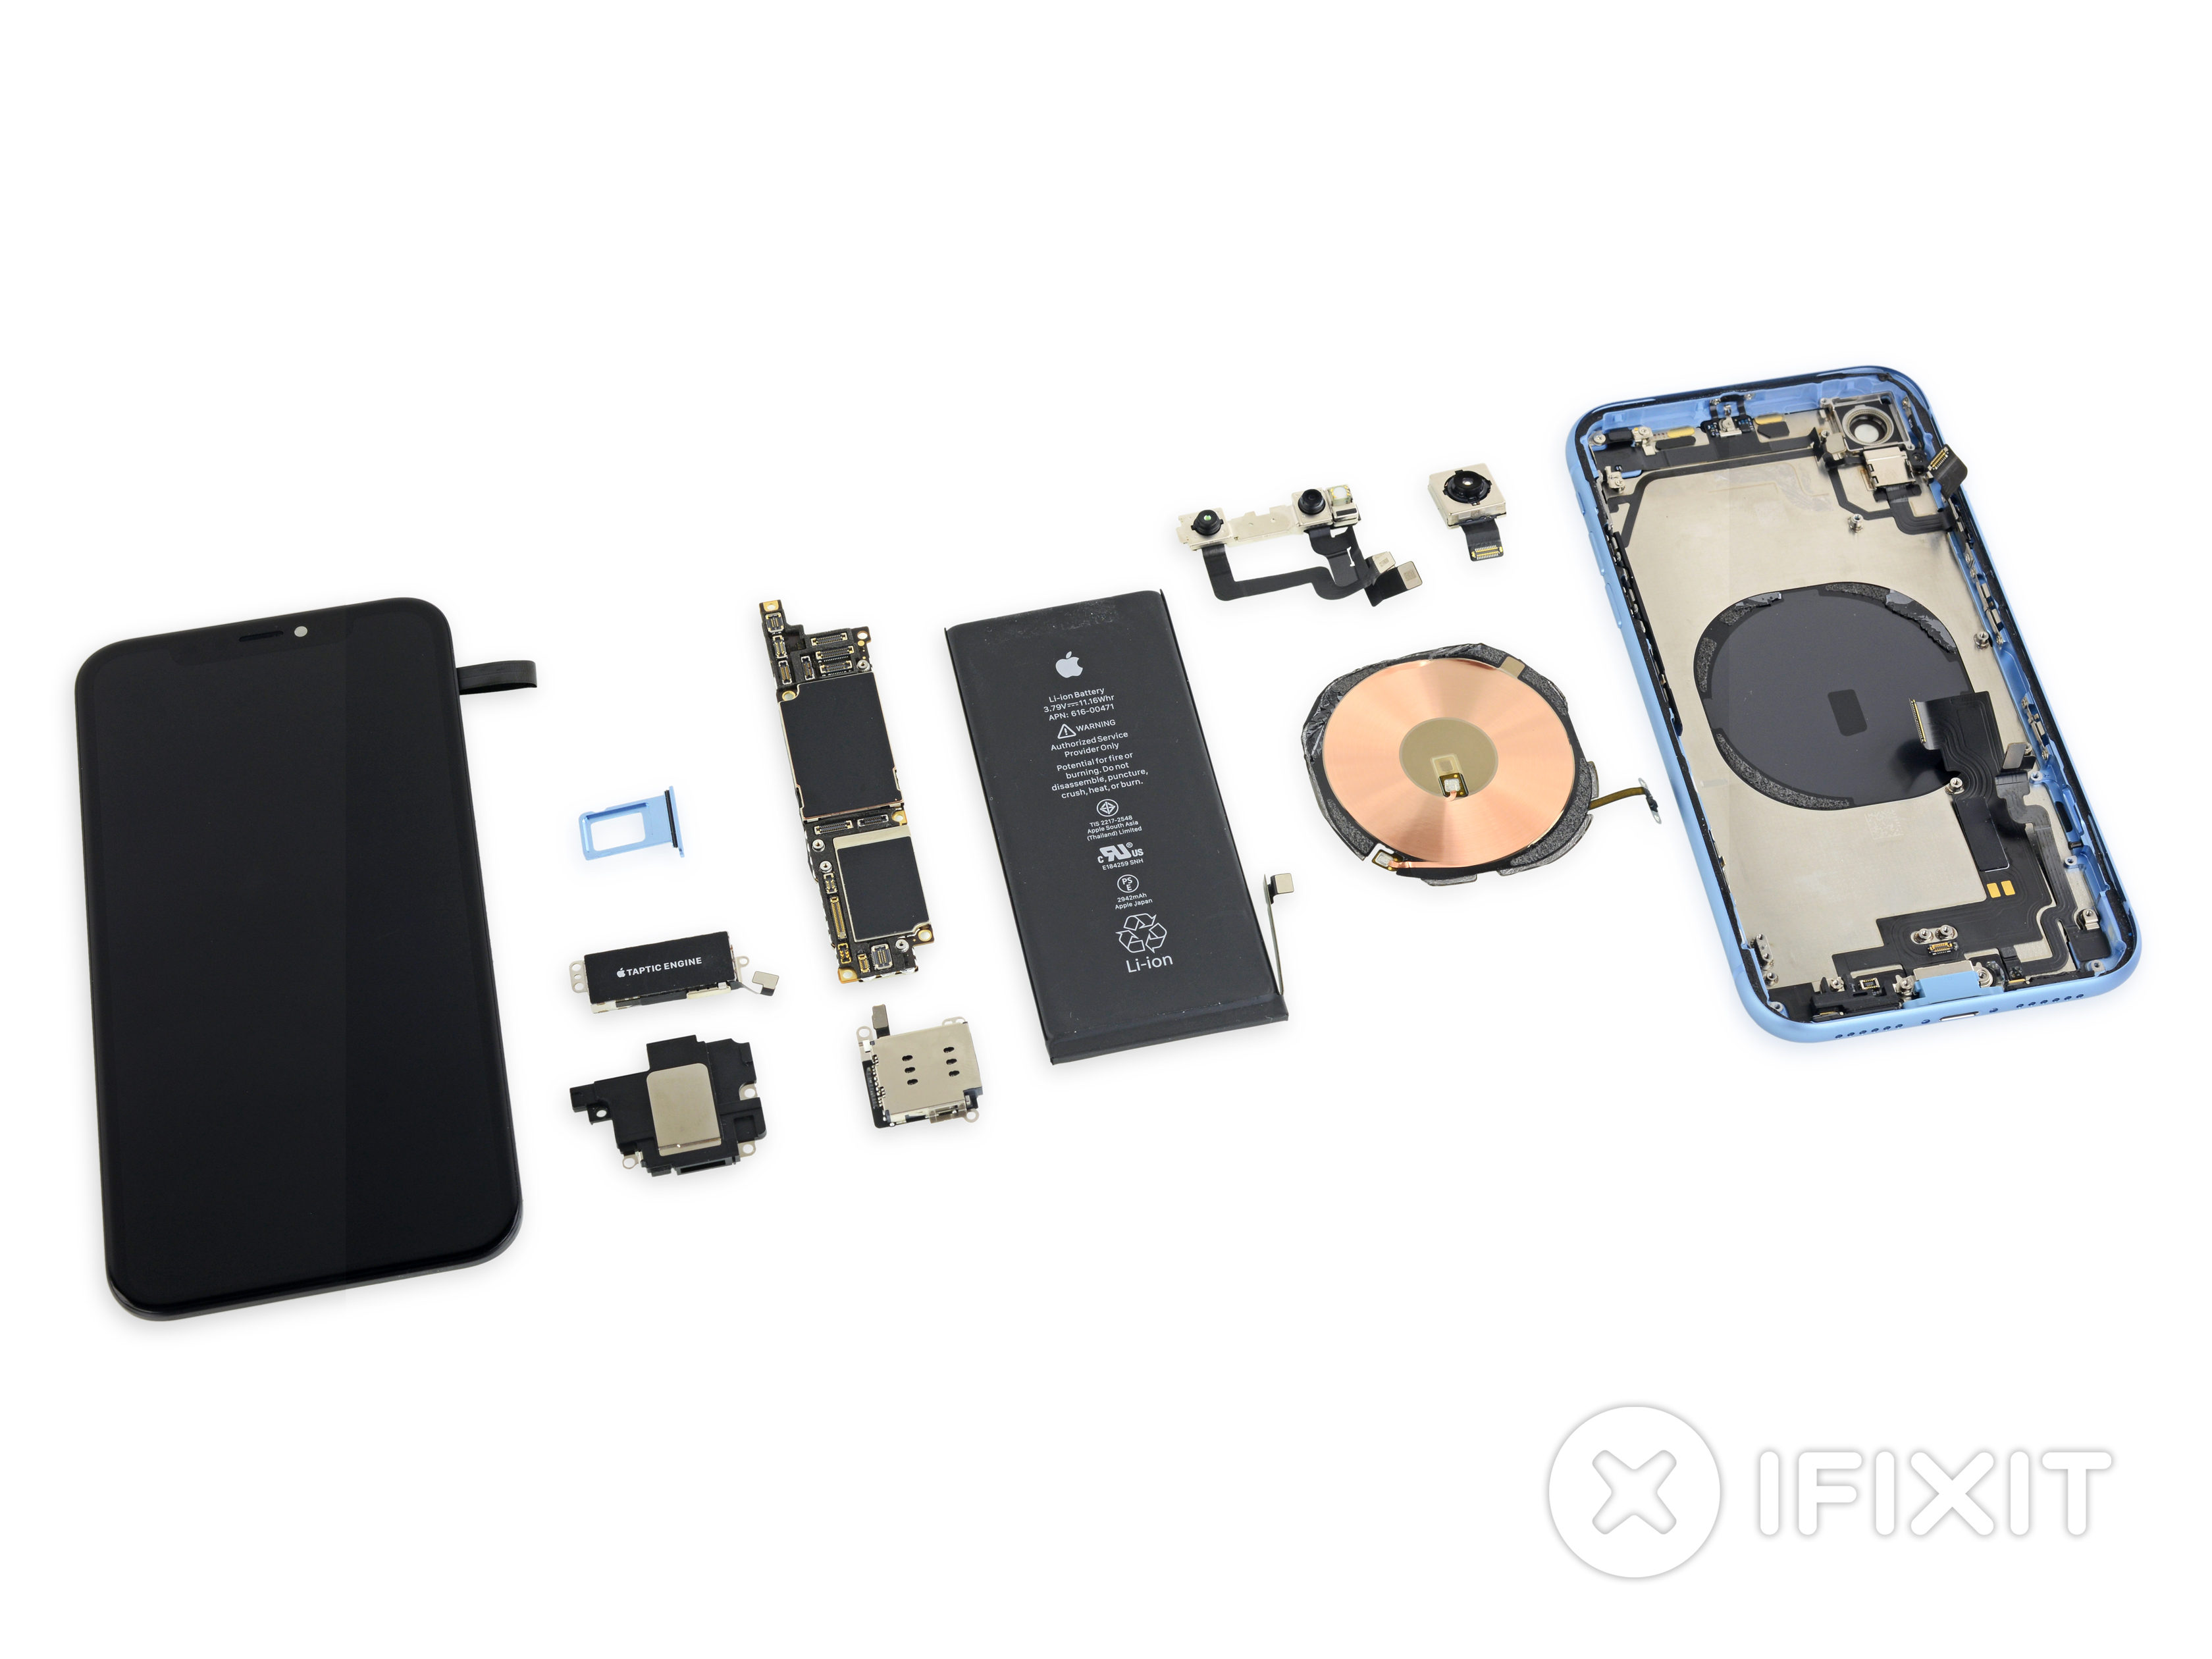 iPhone XR Teardown